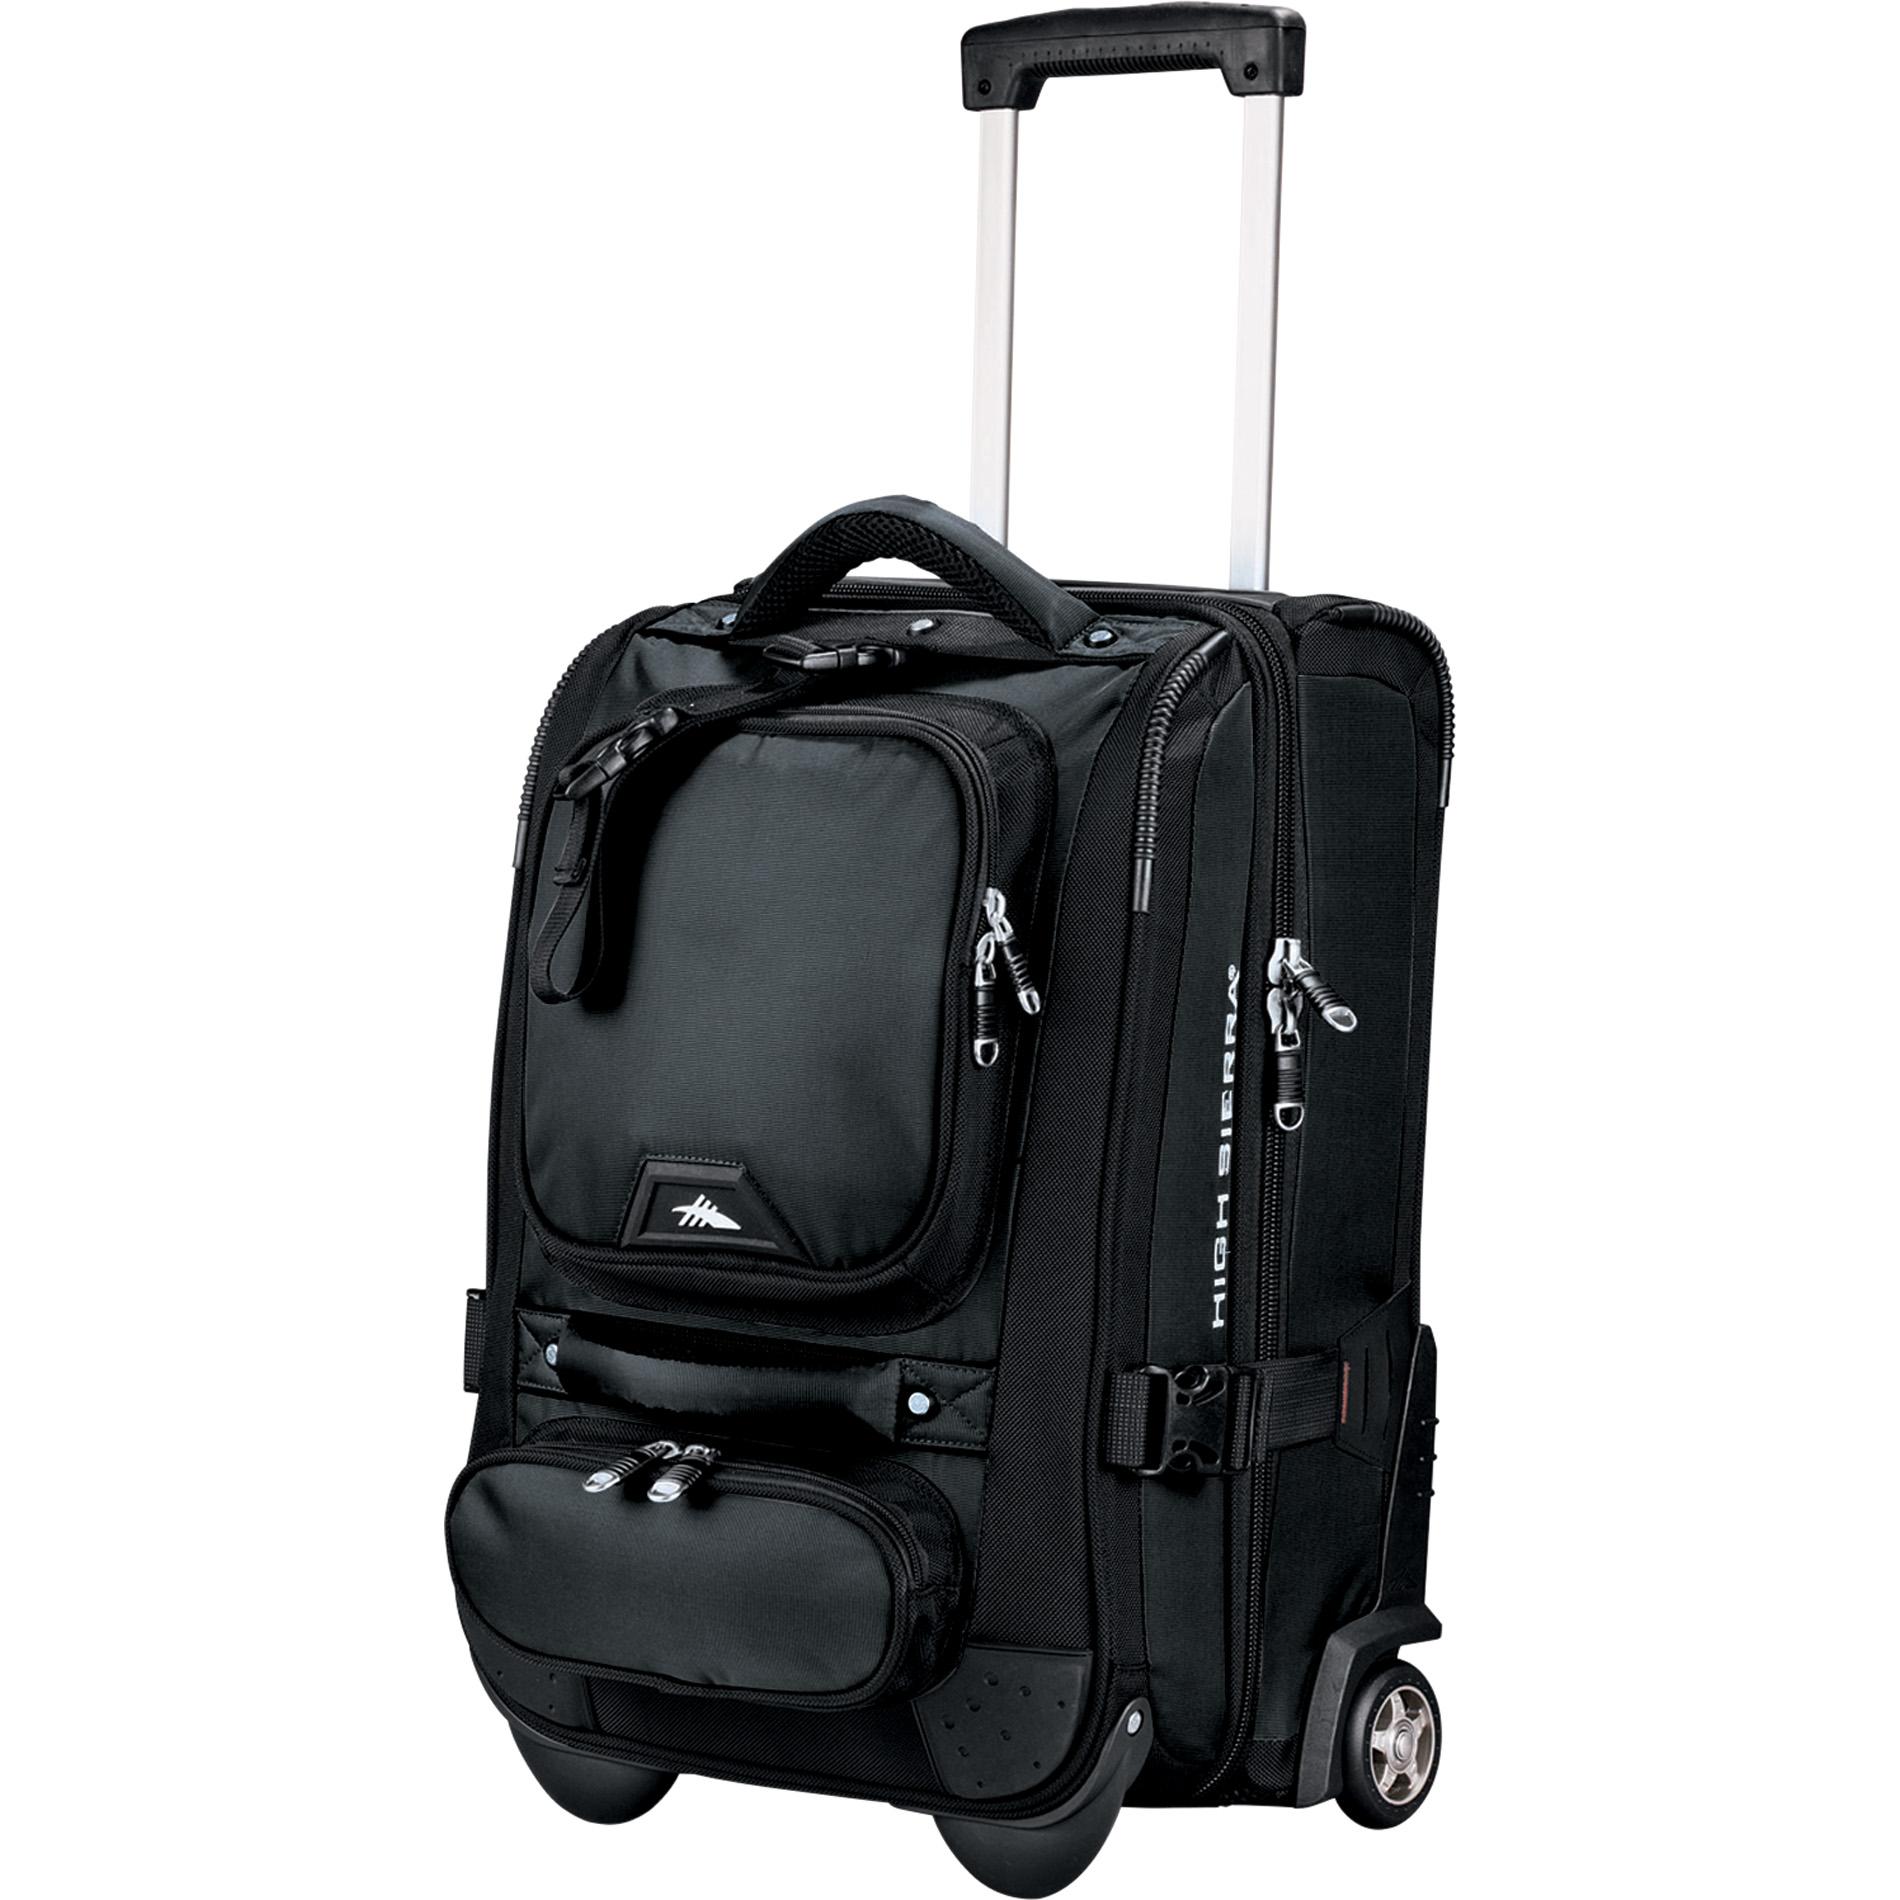 "High Sierra 8050-21 - 21"" Carry-On Upright Duffel Bag"